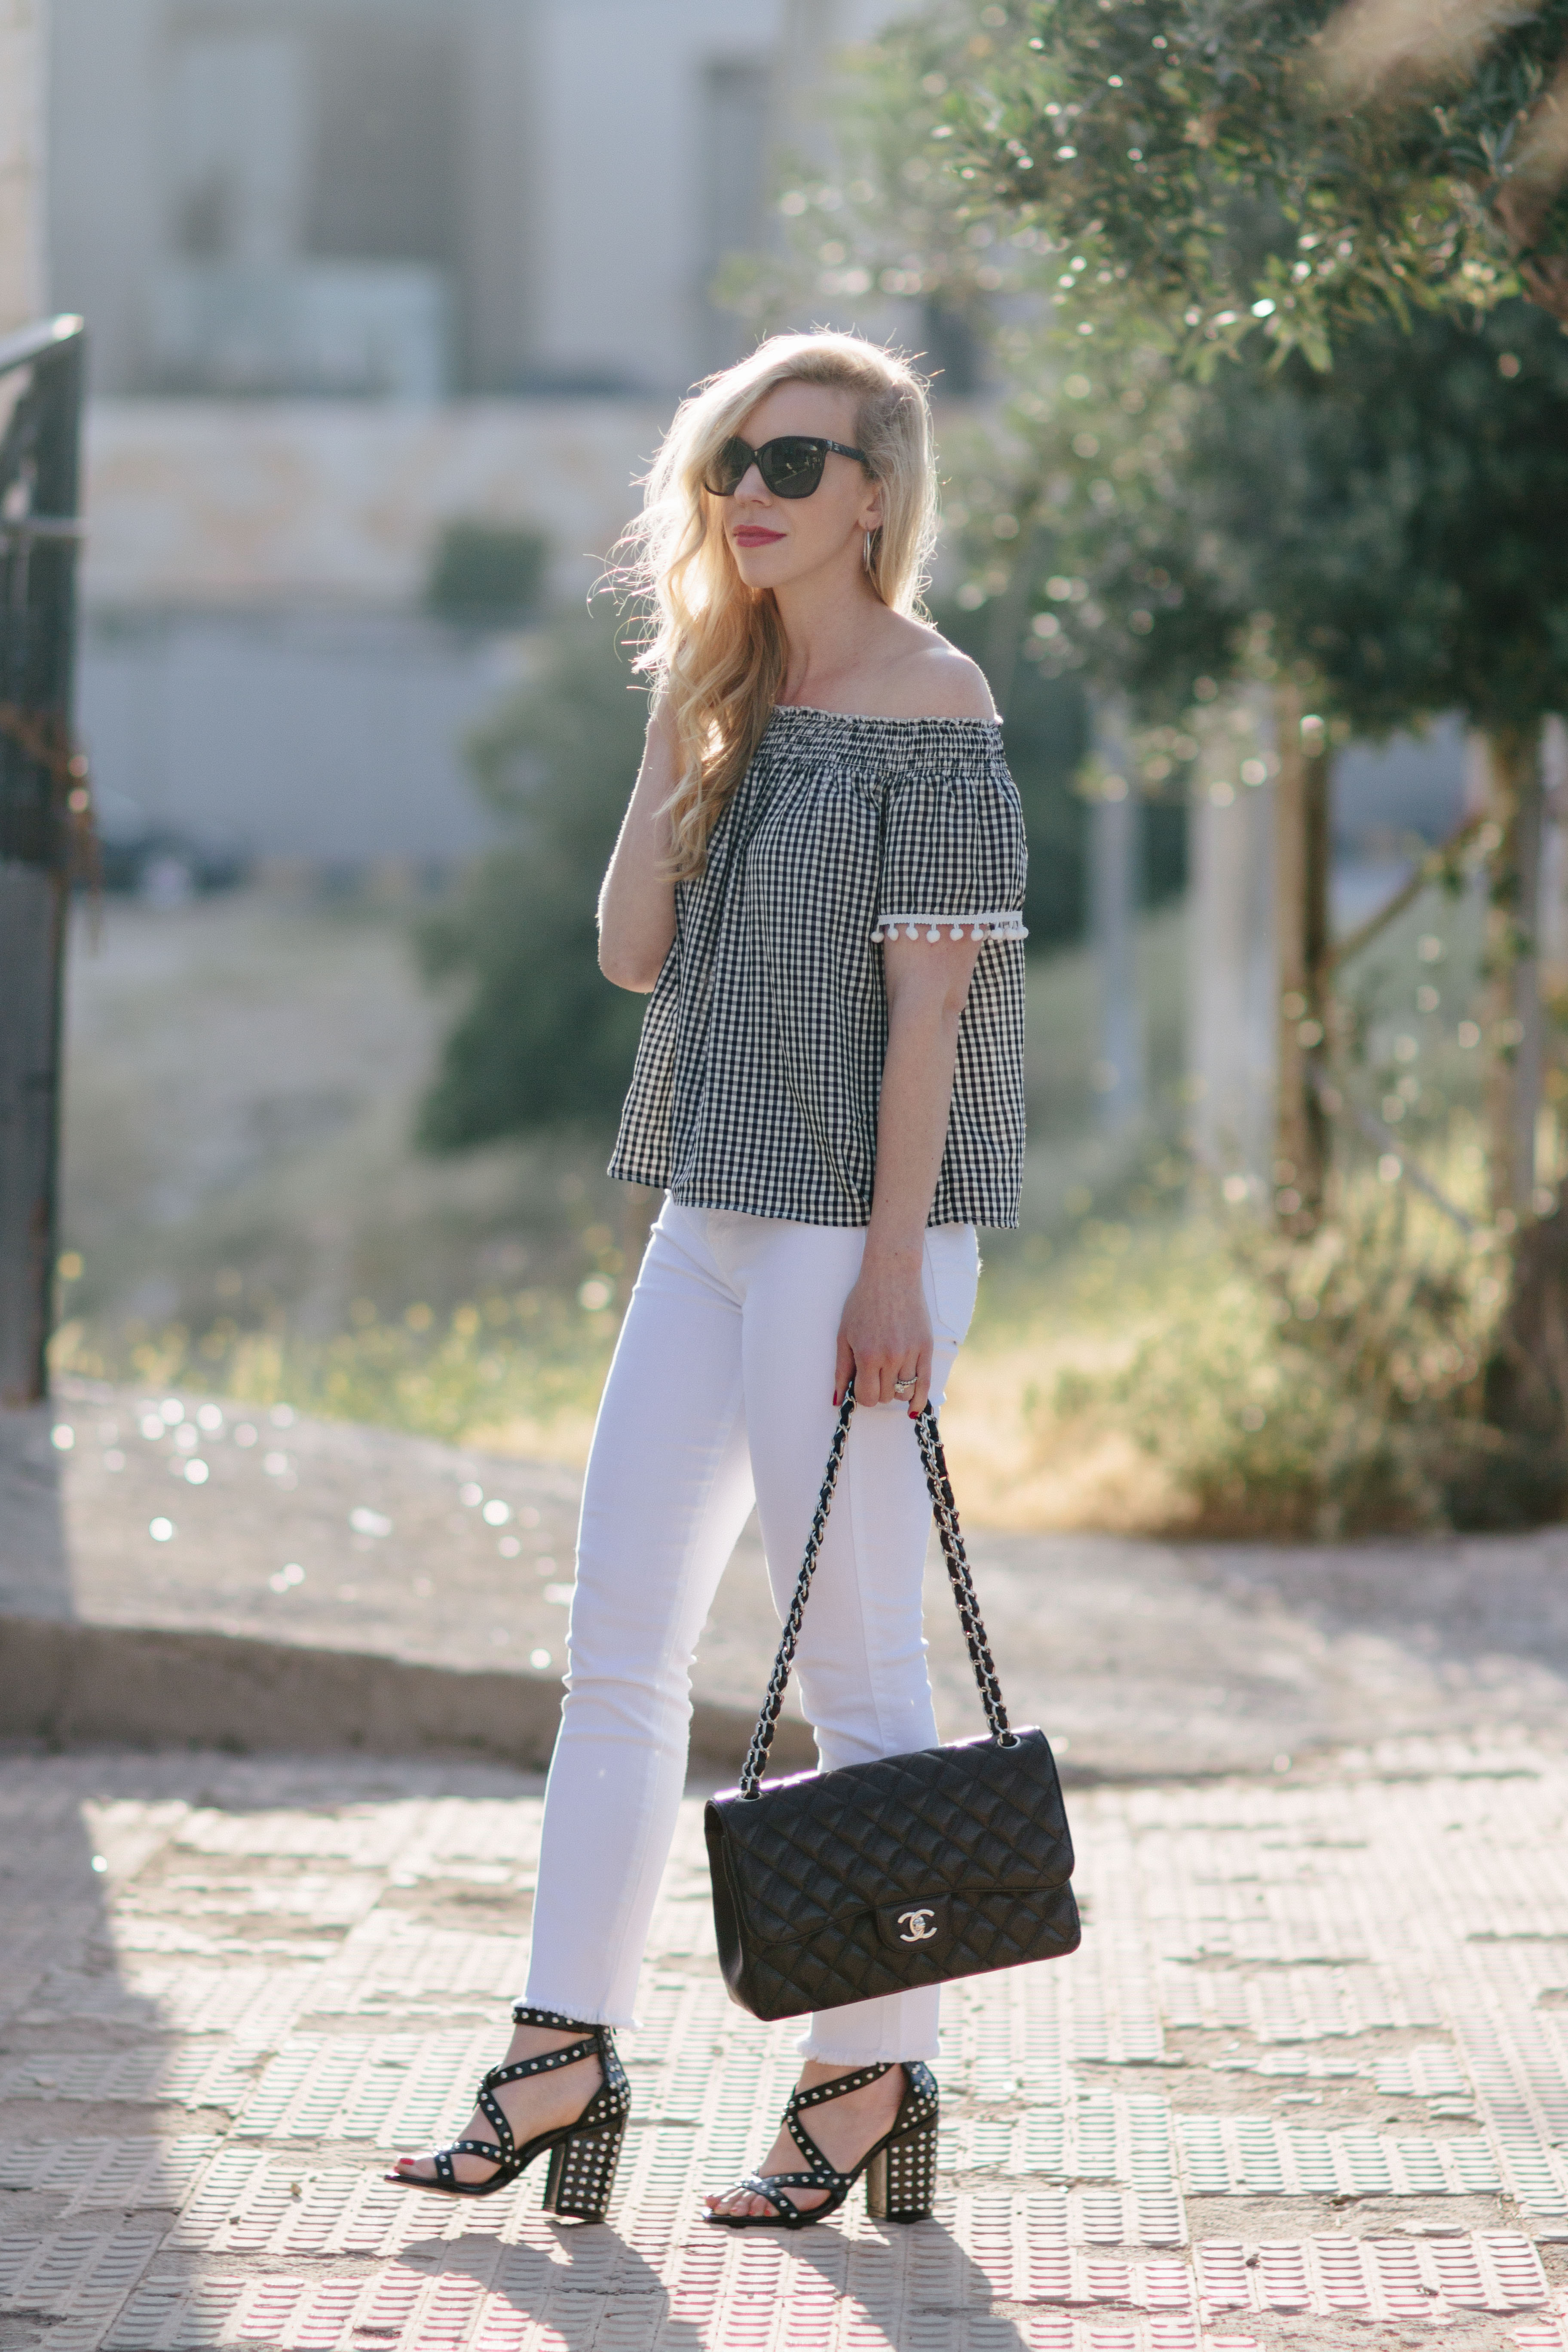 fbeaa22b646 Black & White Gingham Top Under $50 - Meagan's Moda